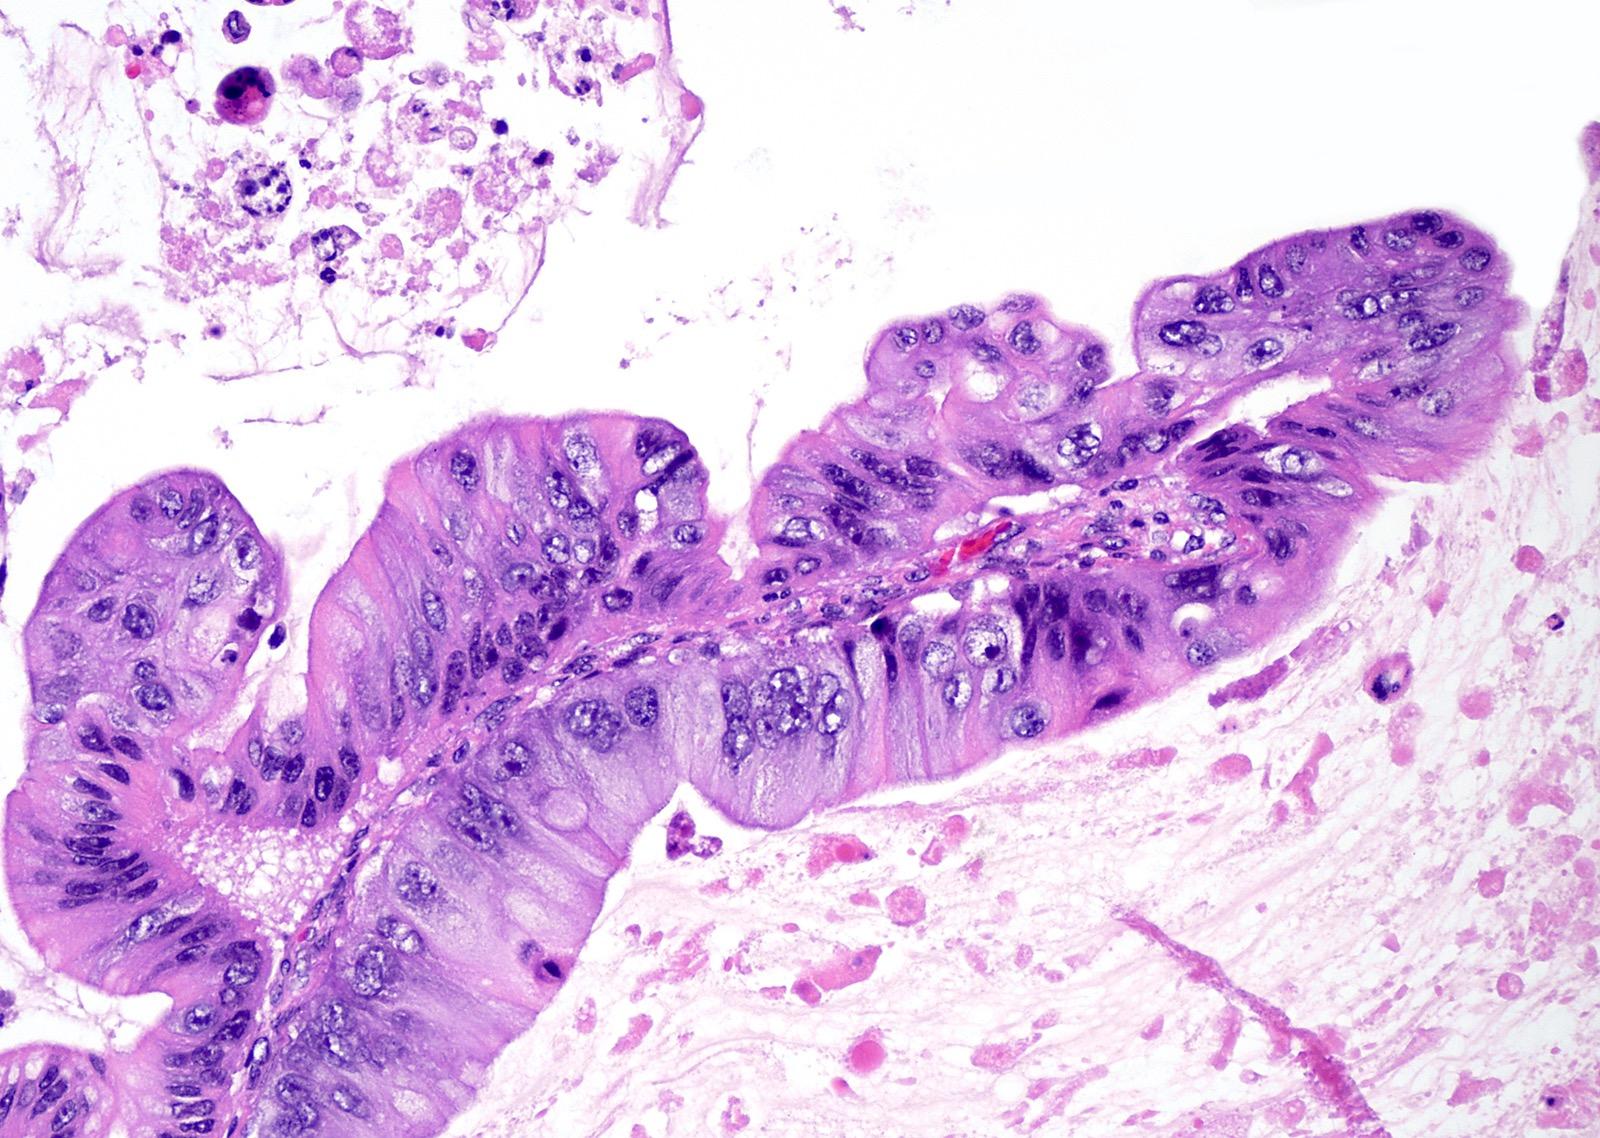 Intraepithelial carcinoma